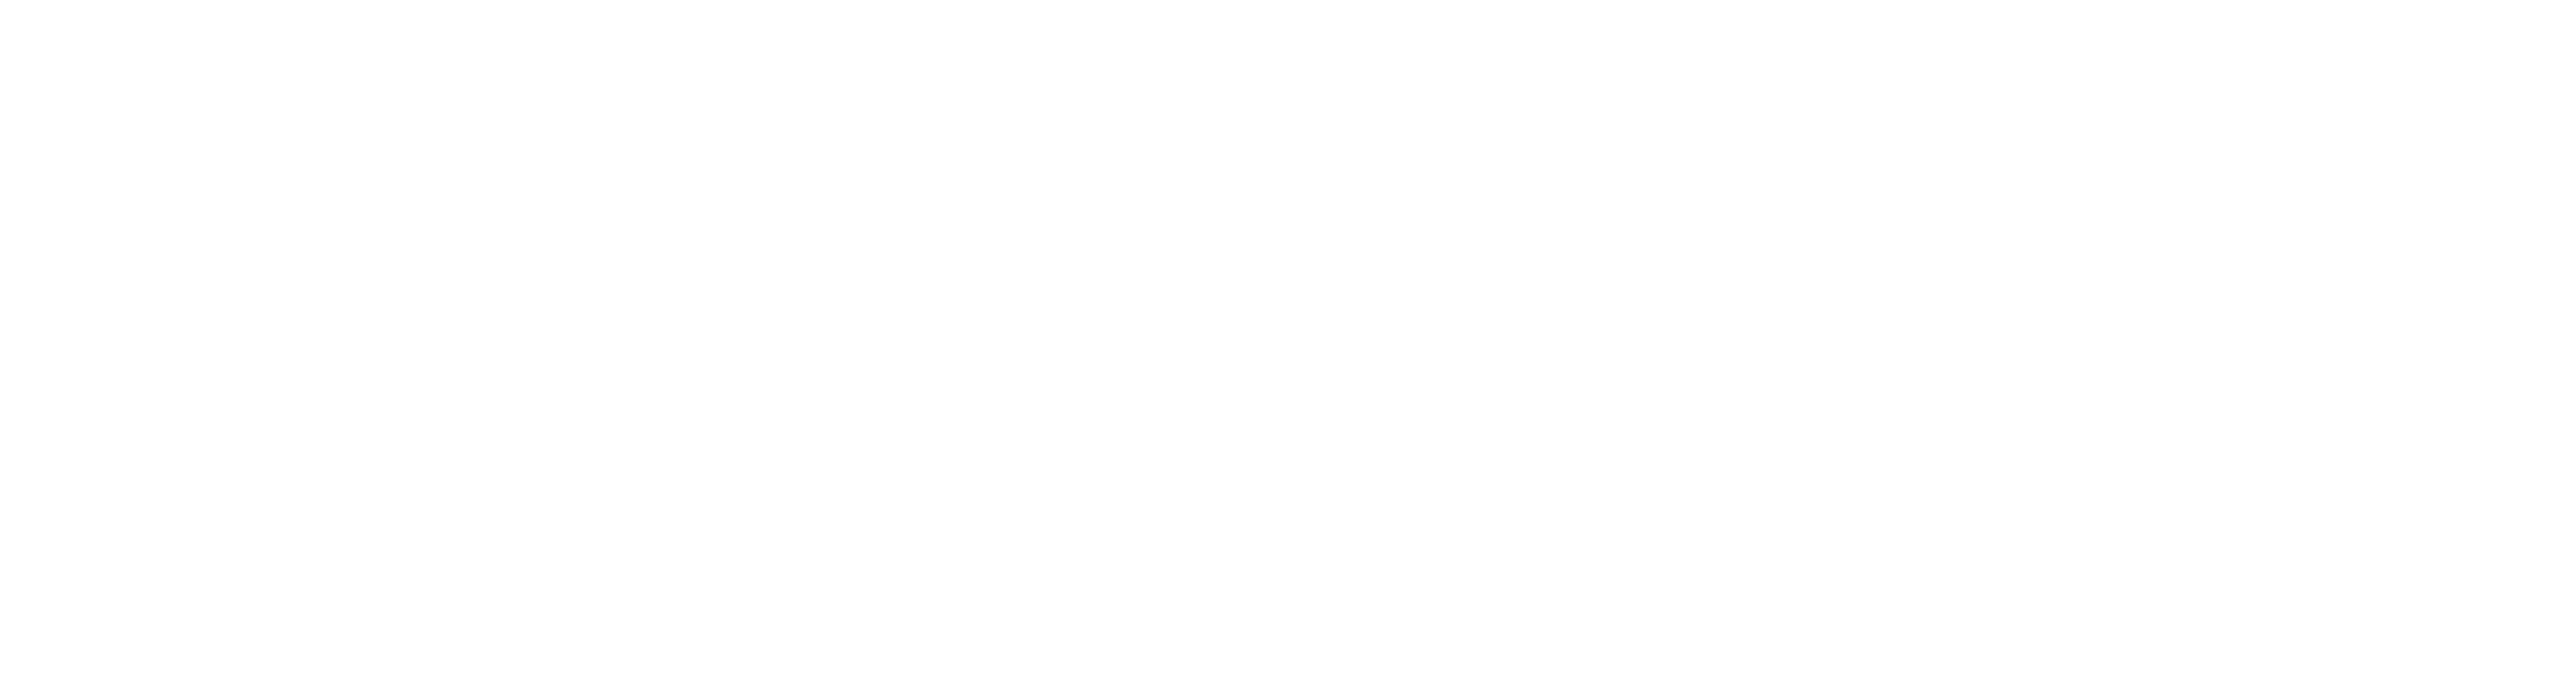 blueboy, the national magazine about men, logo